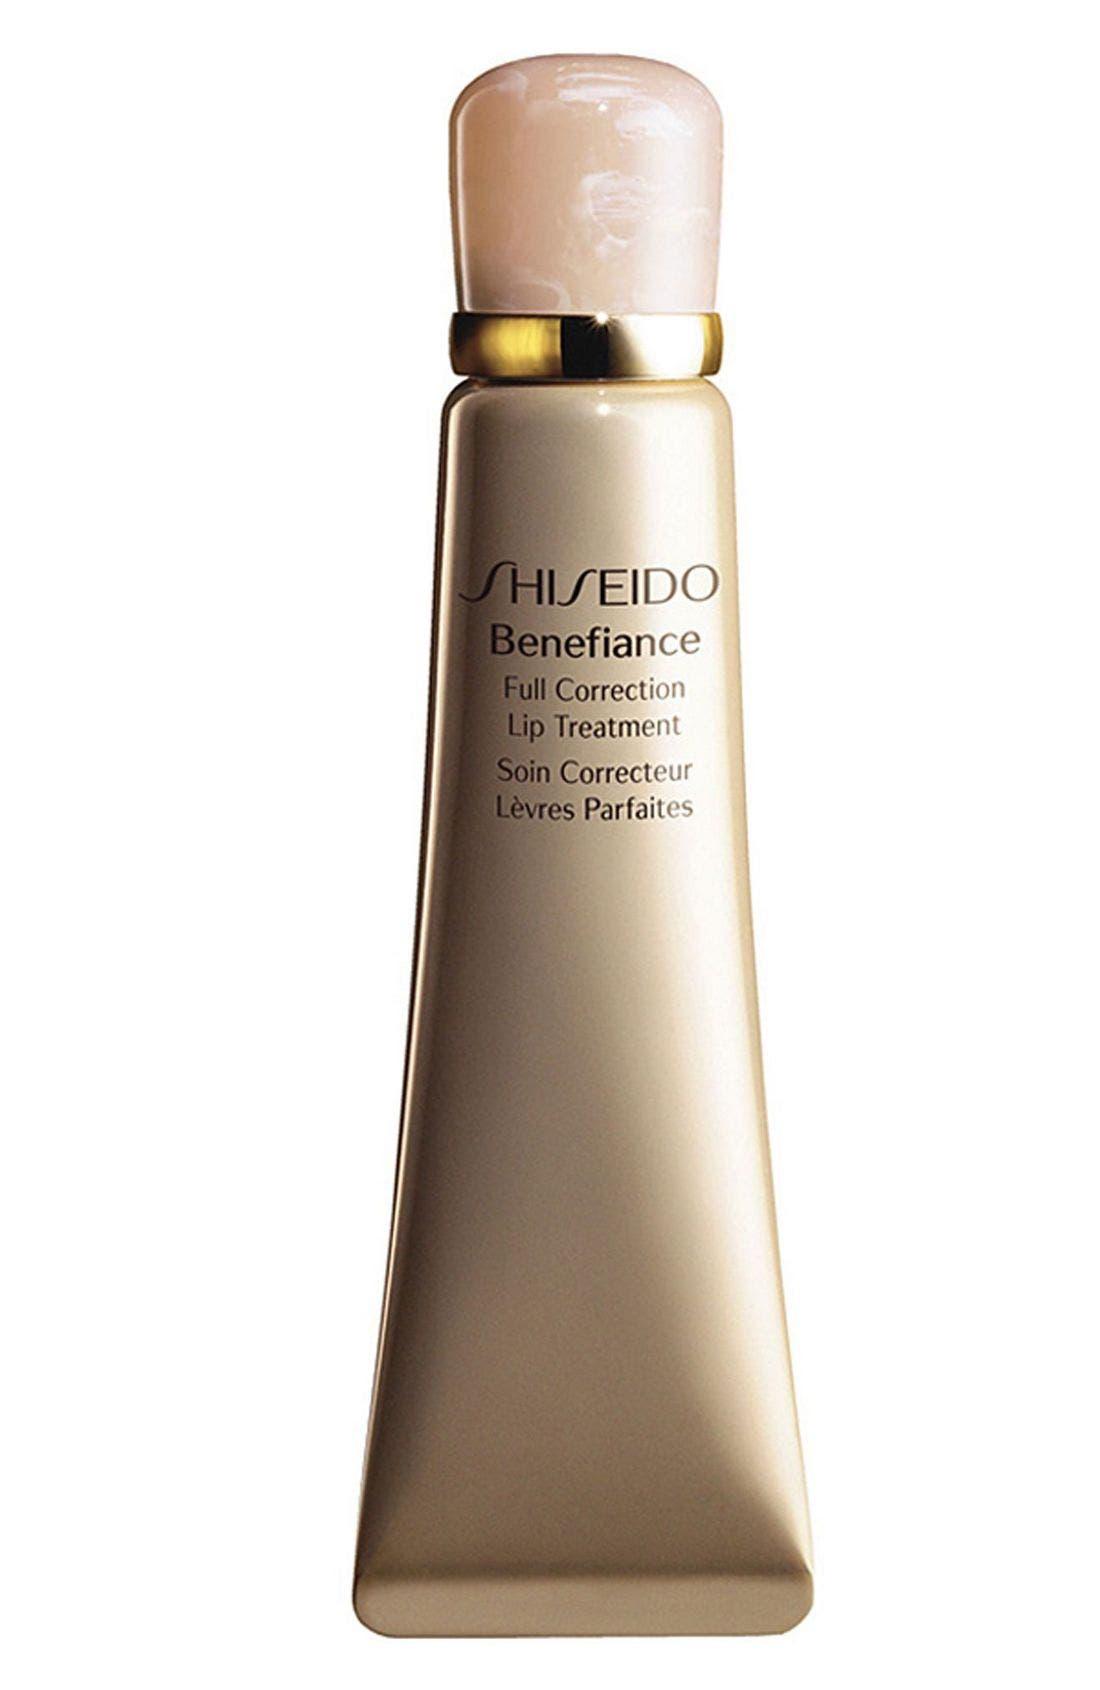 Shiseido 'Benefiance' Full Correction Lip Treatment